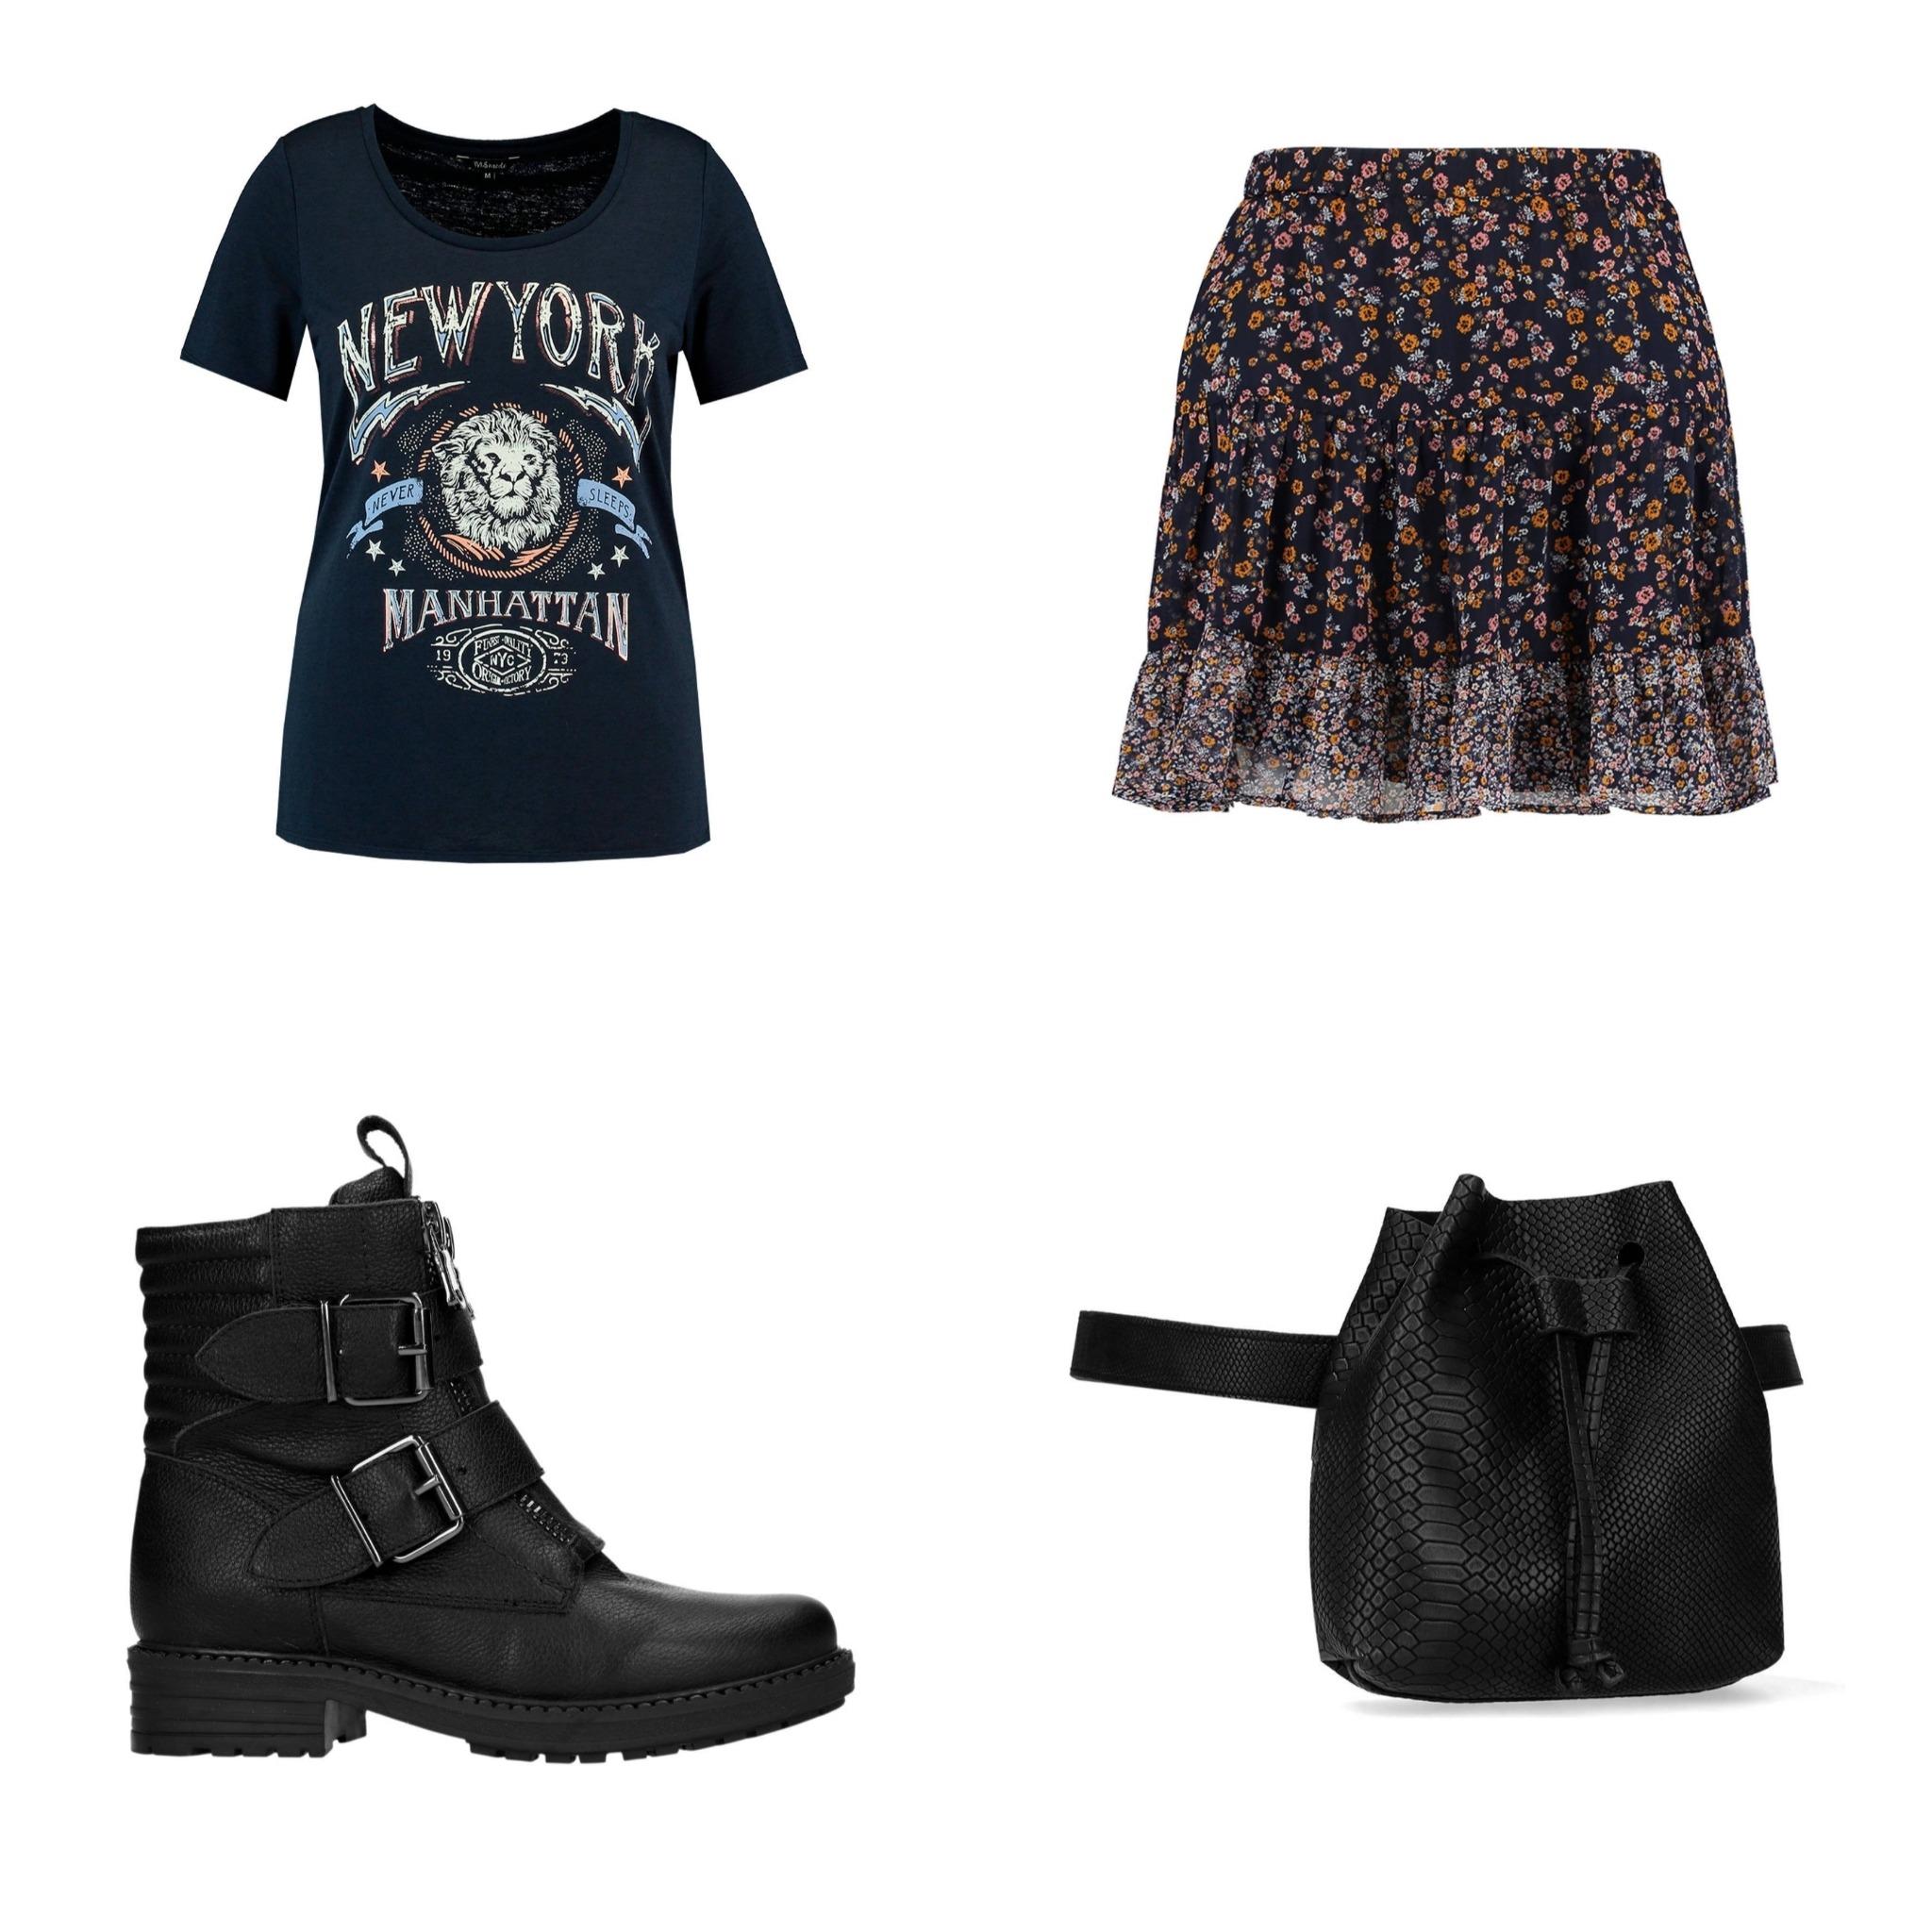 Plus Size Fashion Friday || MS Mode summer inspiration